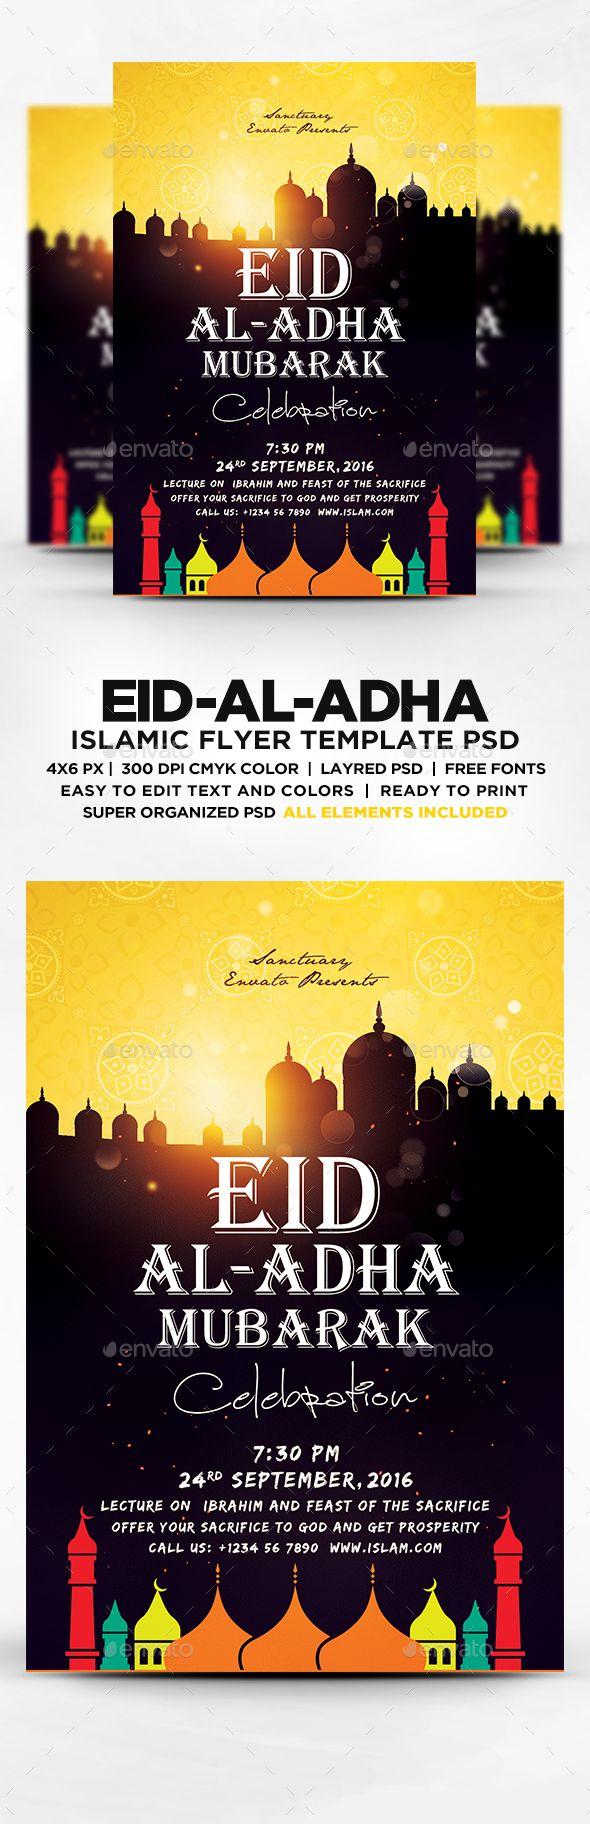 Eid-al-Adha Islamic Celebration Flyer PSD  Download now : https://graphicriver.net/item/eidaladha-islamic-celebration-flyer-psd/17162556?ref=iDoodle